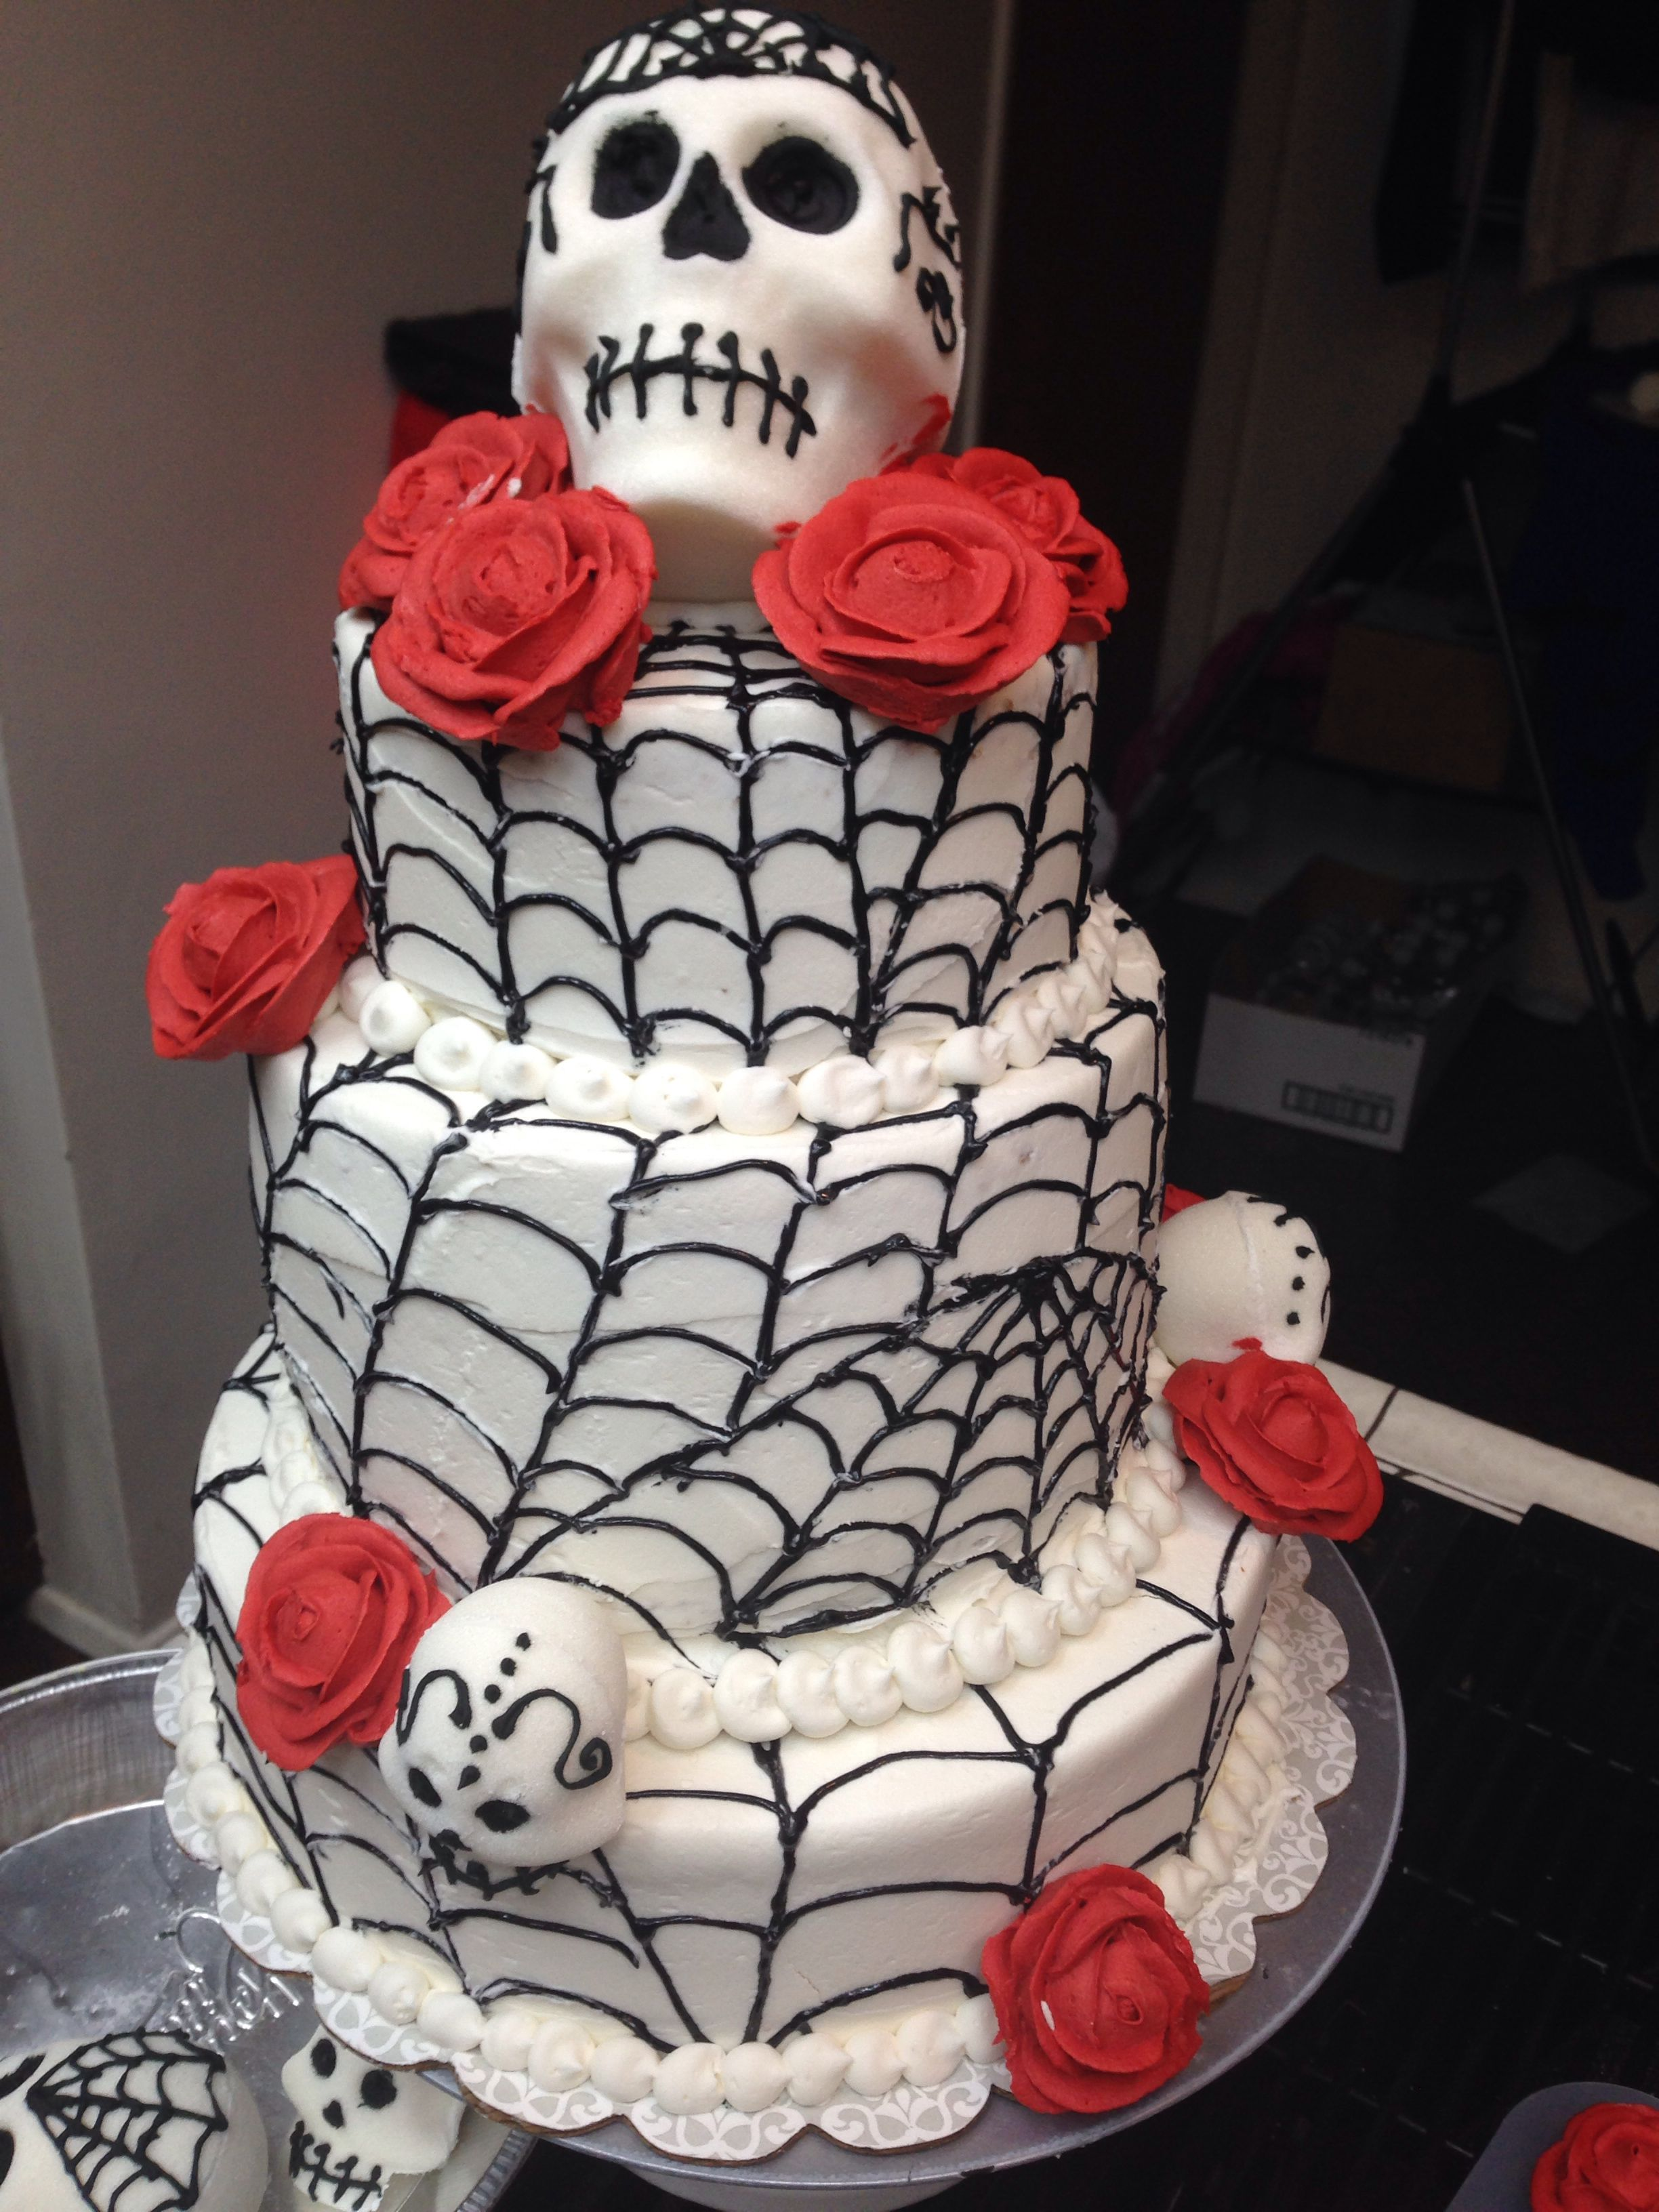 DIA de los MUERTOS halloween cake. Made by cakes by danie